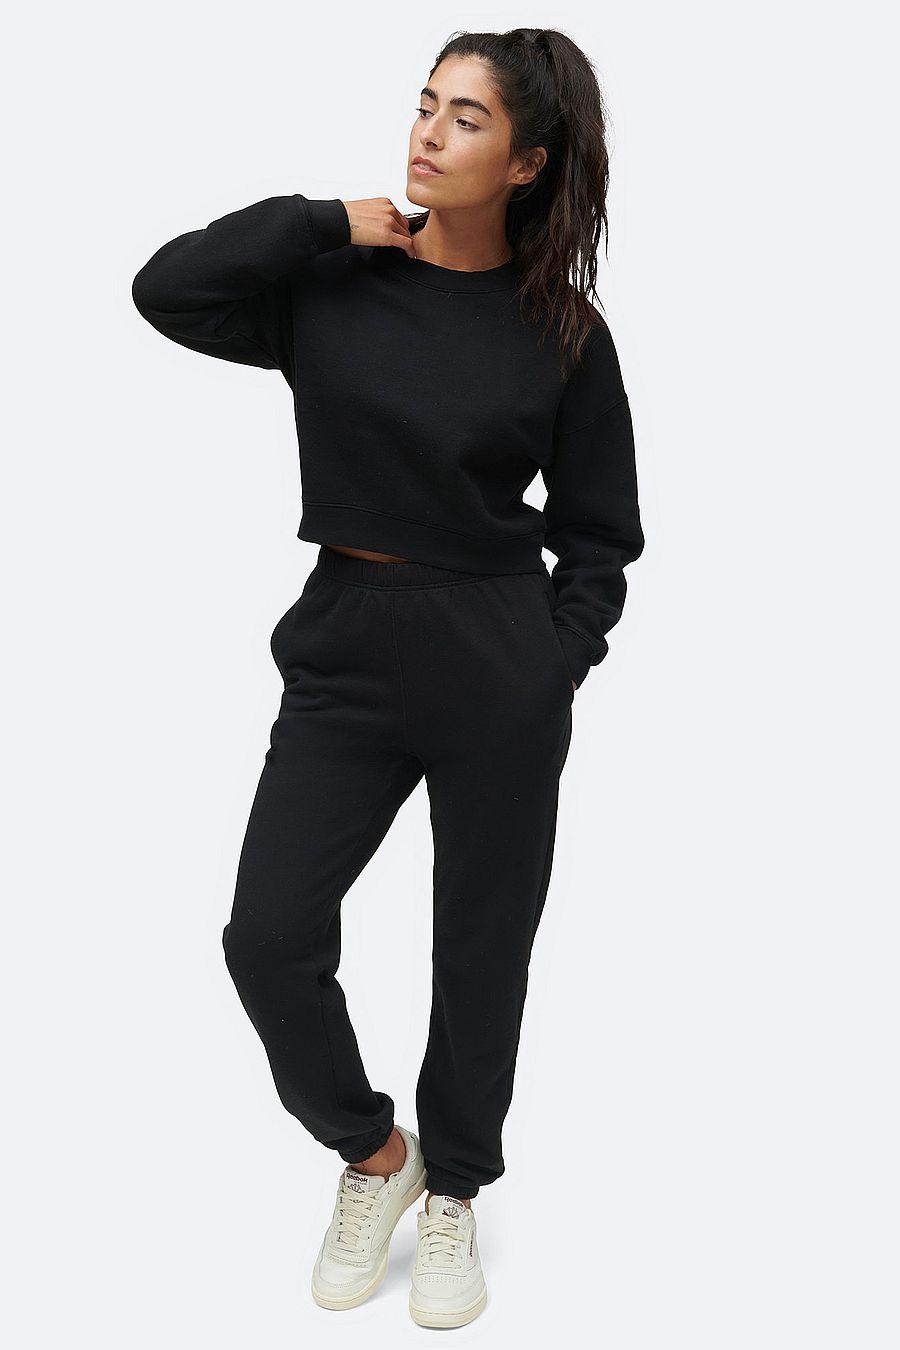 MATE The Label Fleece Relaxed Pocket Sweatpant - JET BLACK